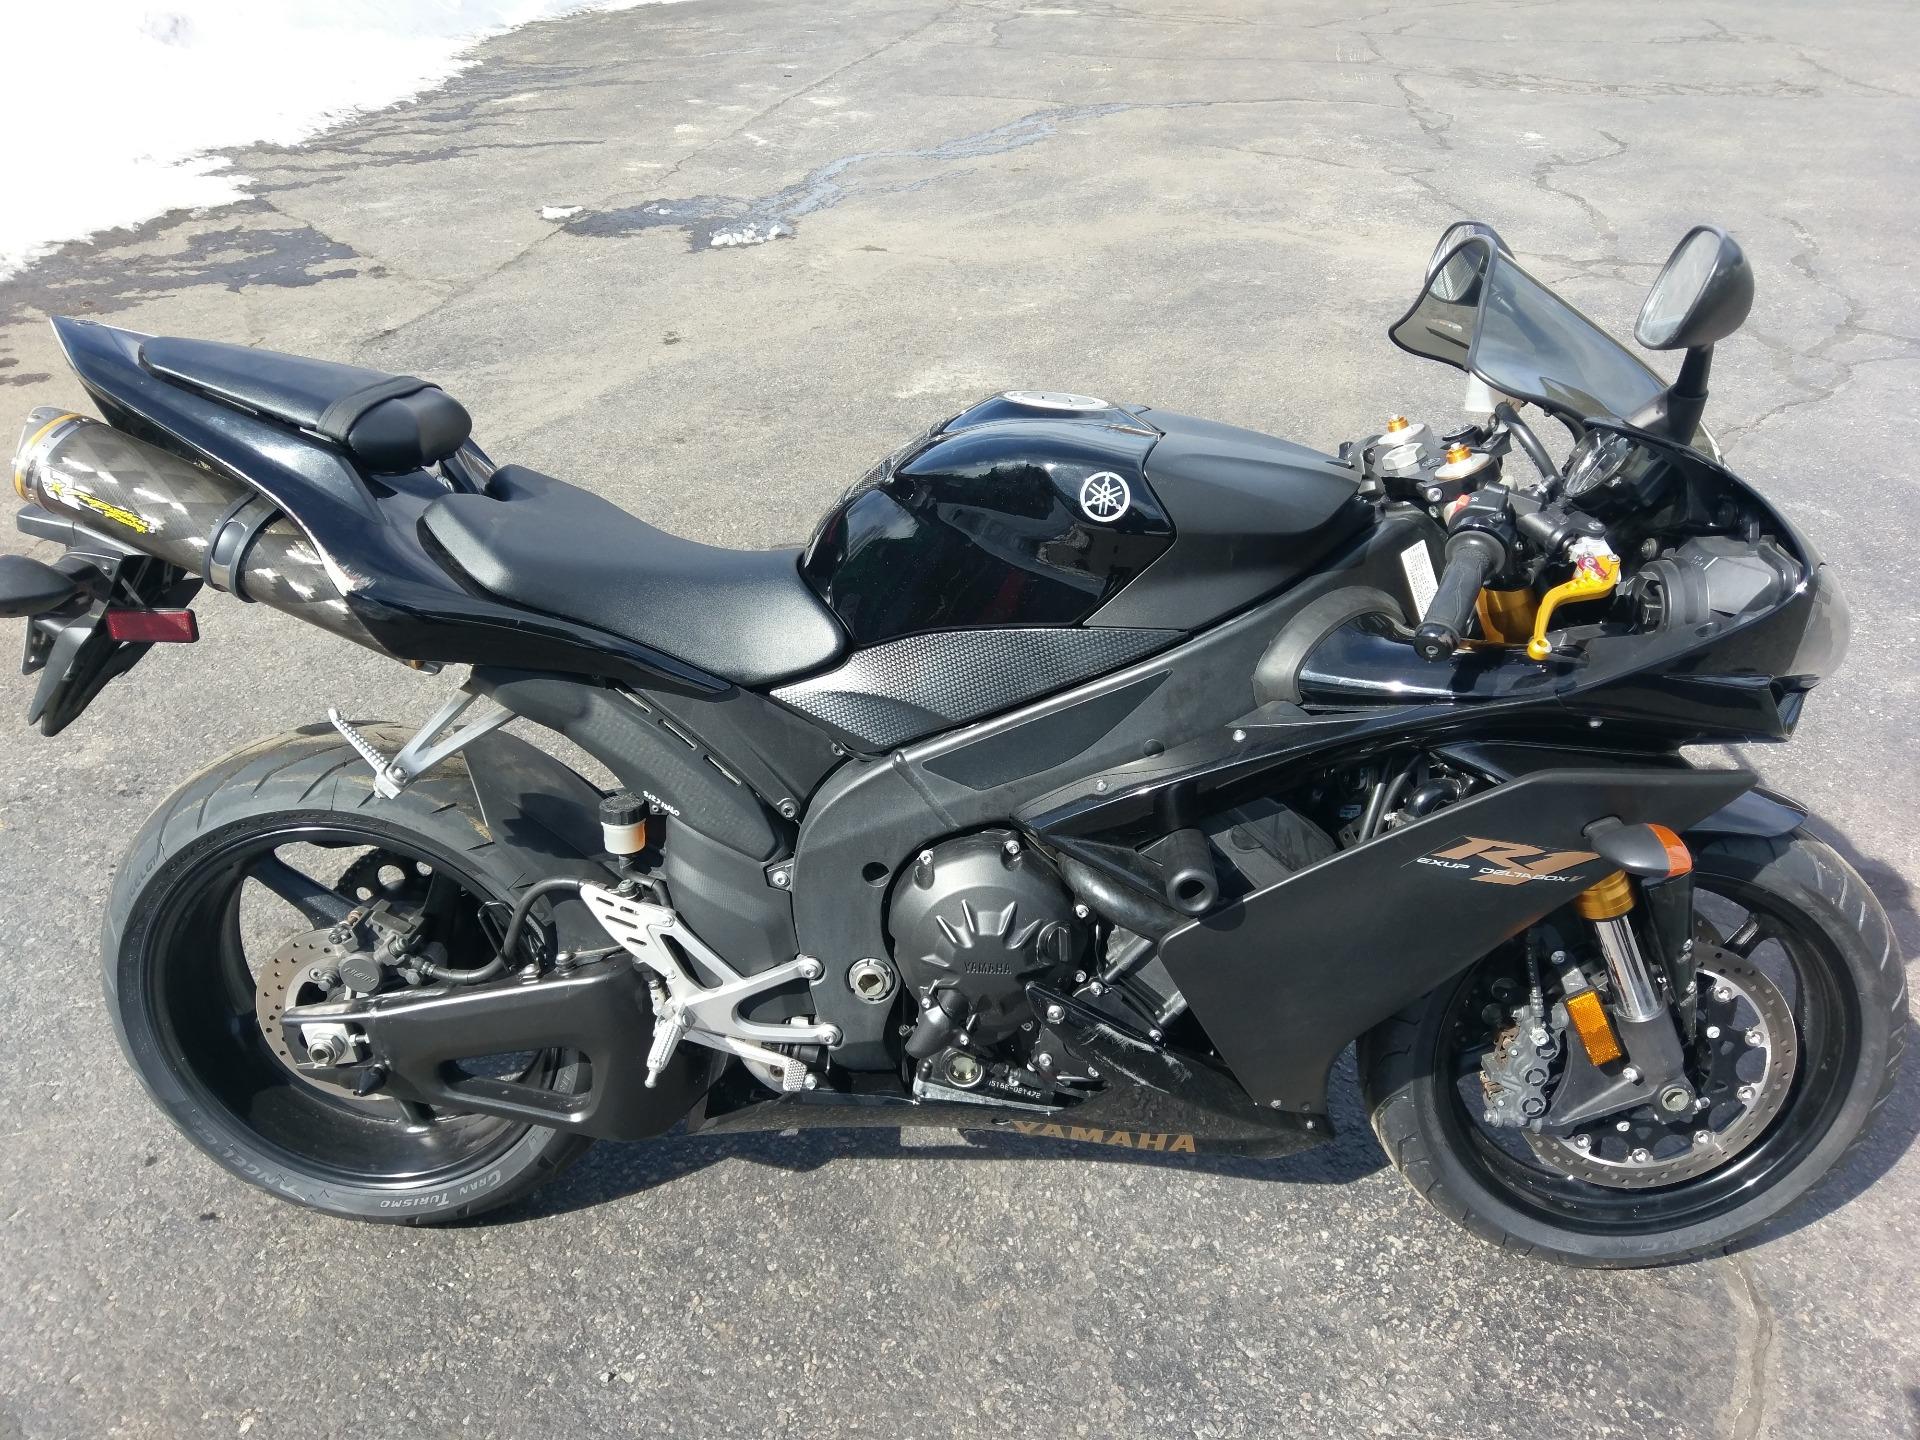 2008 Yamaha YZF-R1 for sale 135184